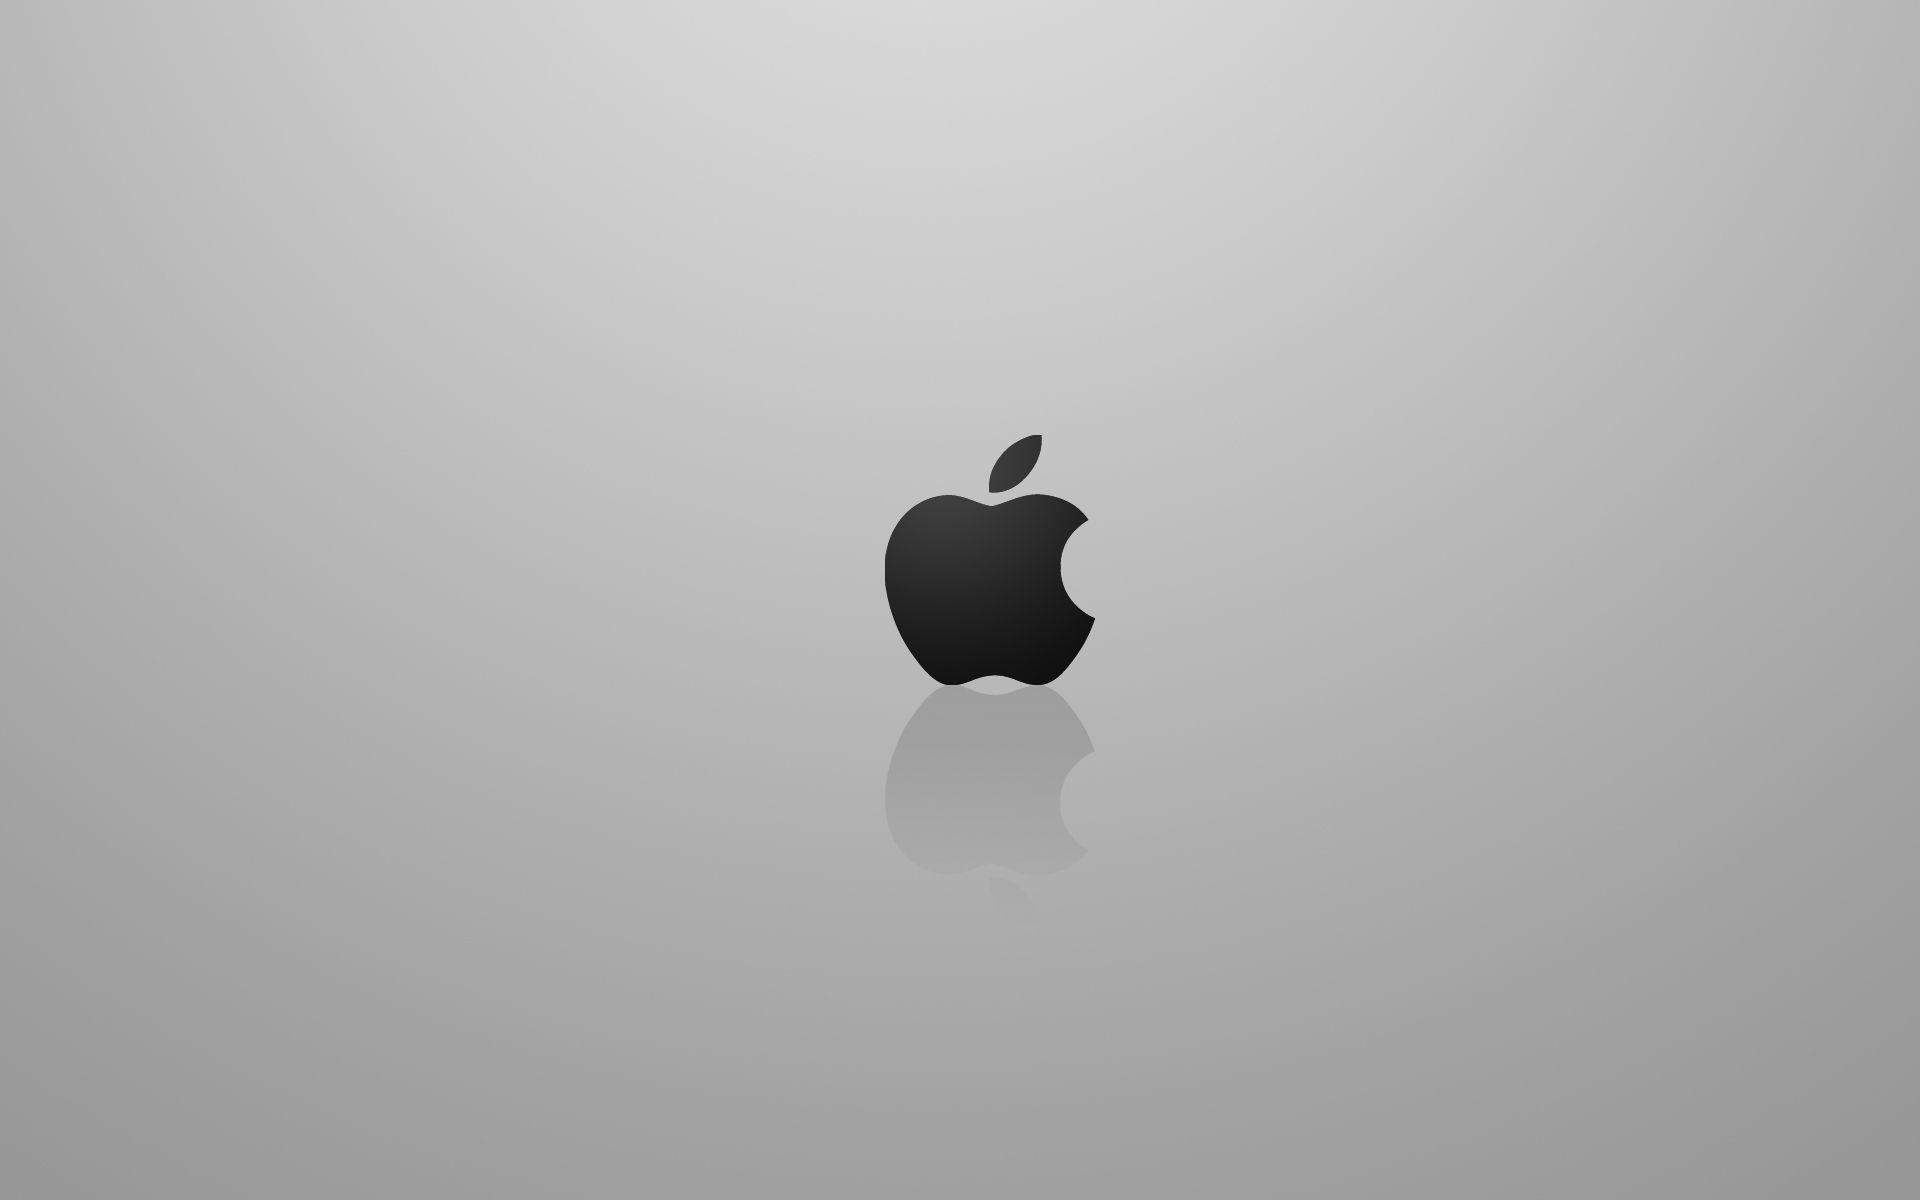 HD Apple wallpaper Desktop Wallpapers System wallpaper 19201200 1920x1200